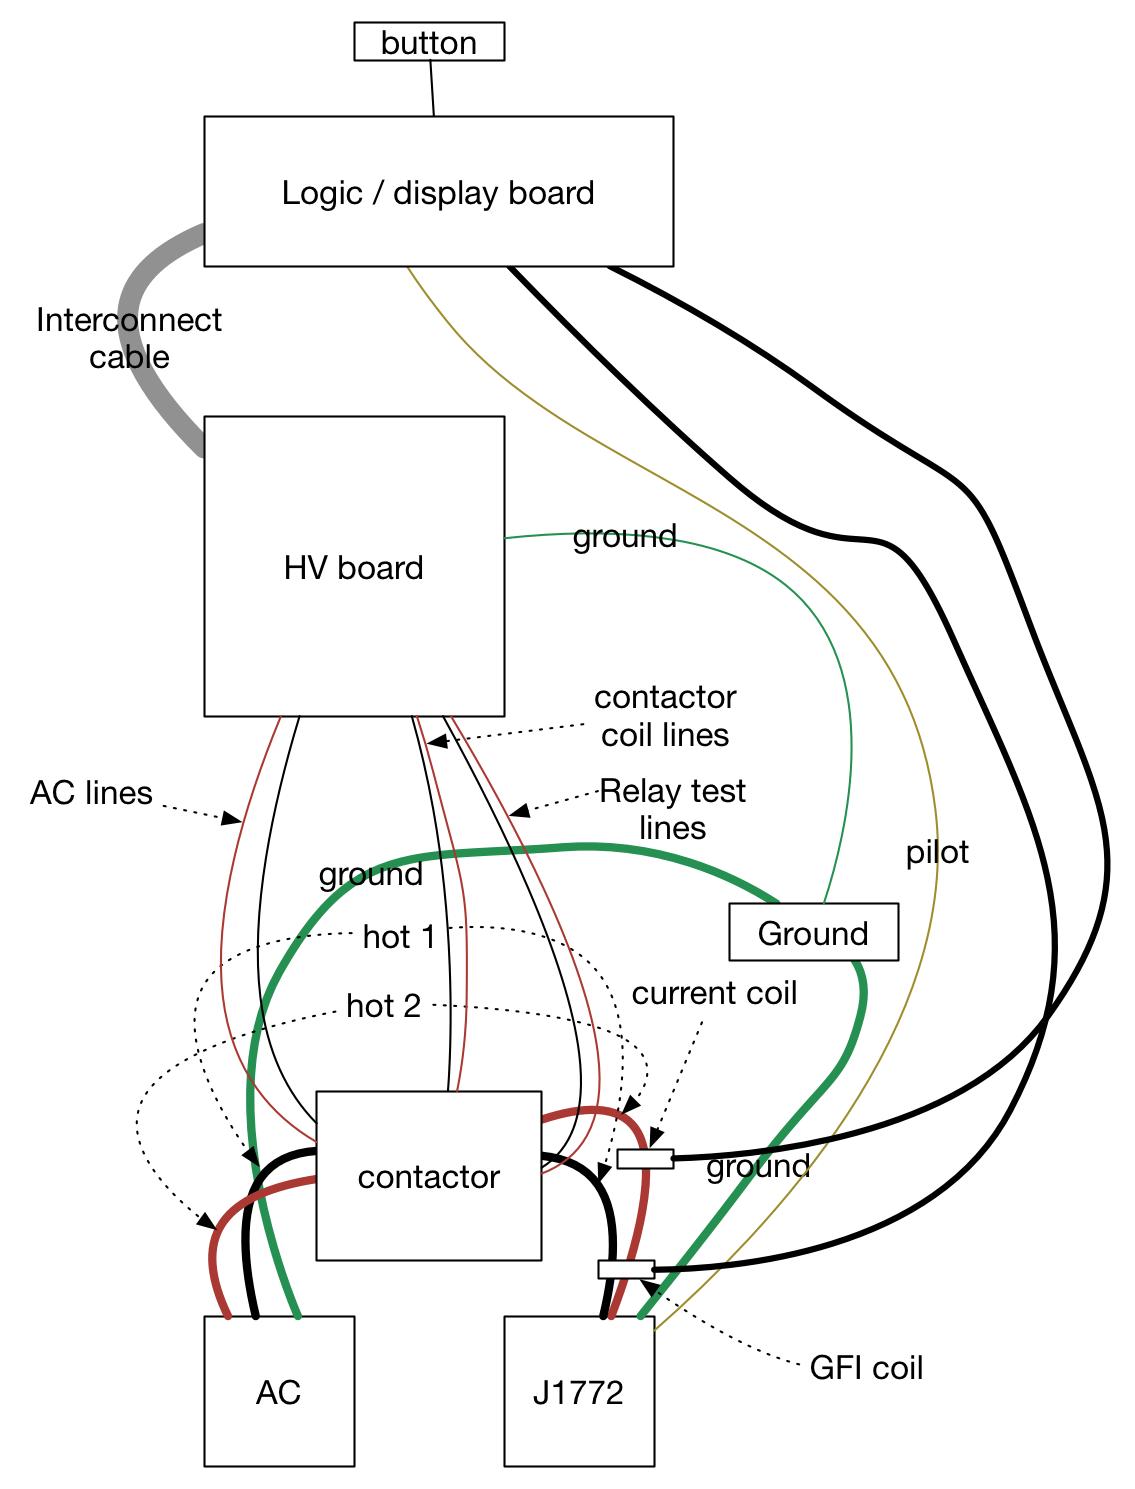 hight resolution of wiring diagram for underfloor heating contactor